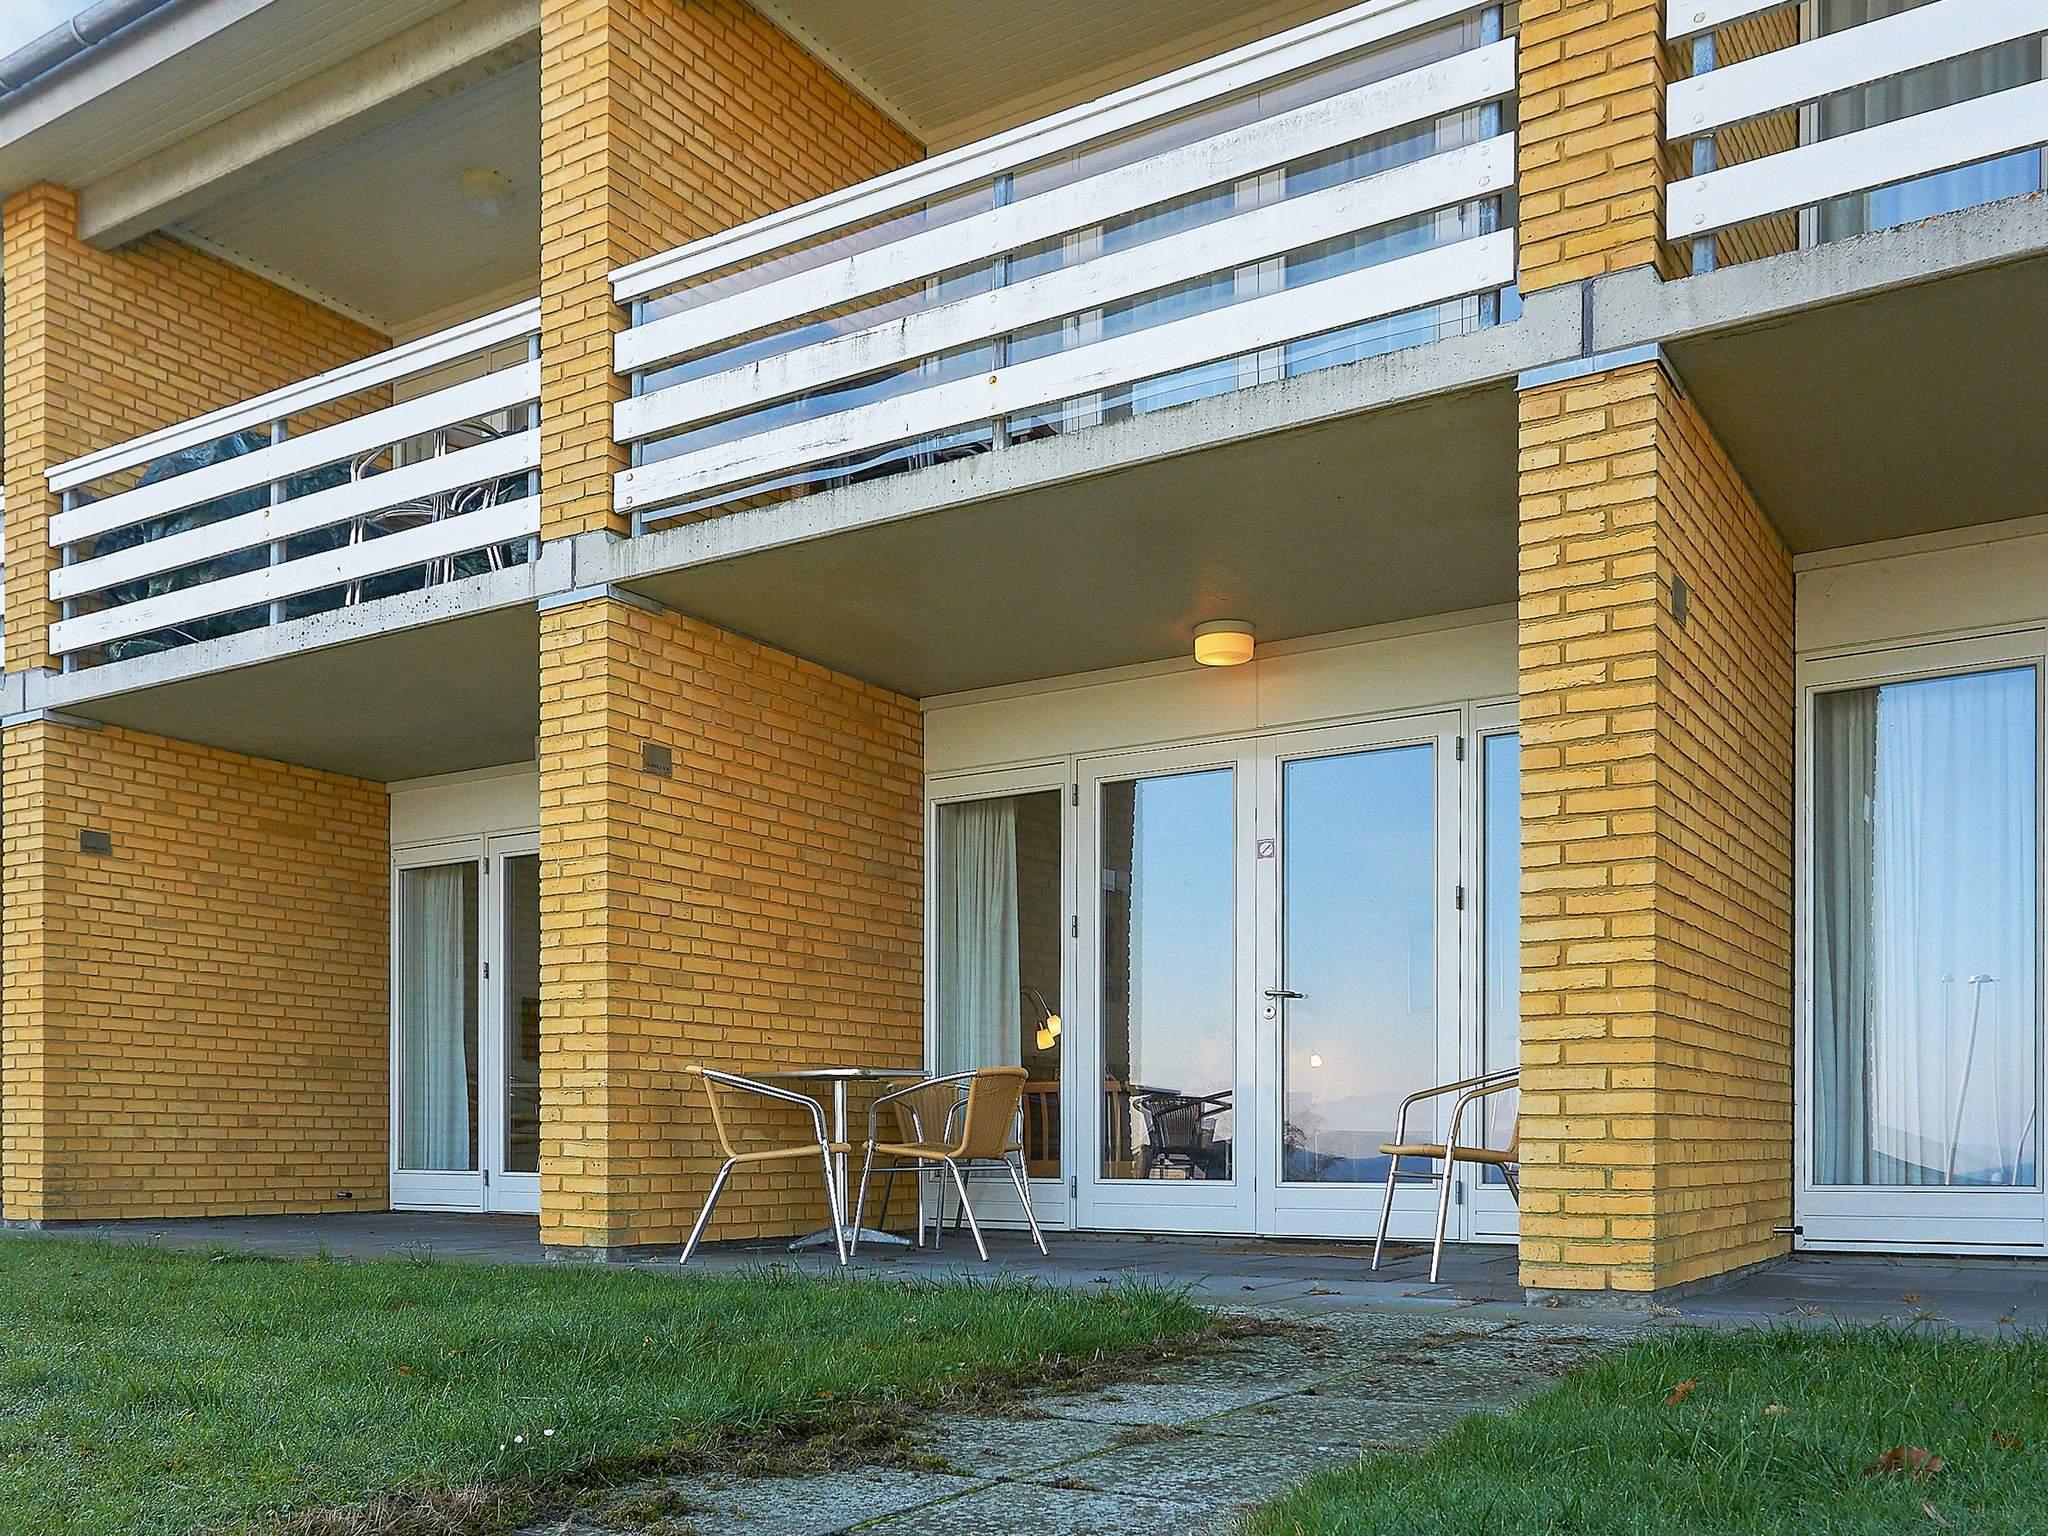 Ferienwohnung Sandkås (2523750), Sandkås, , Bornholm, Dänemark, Bild 1